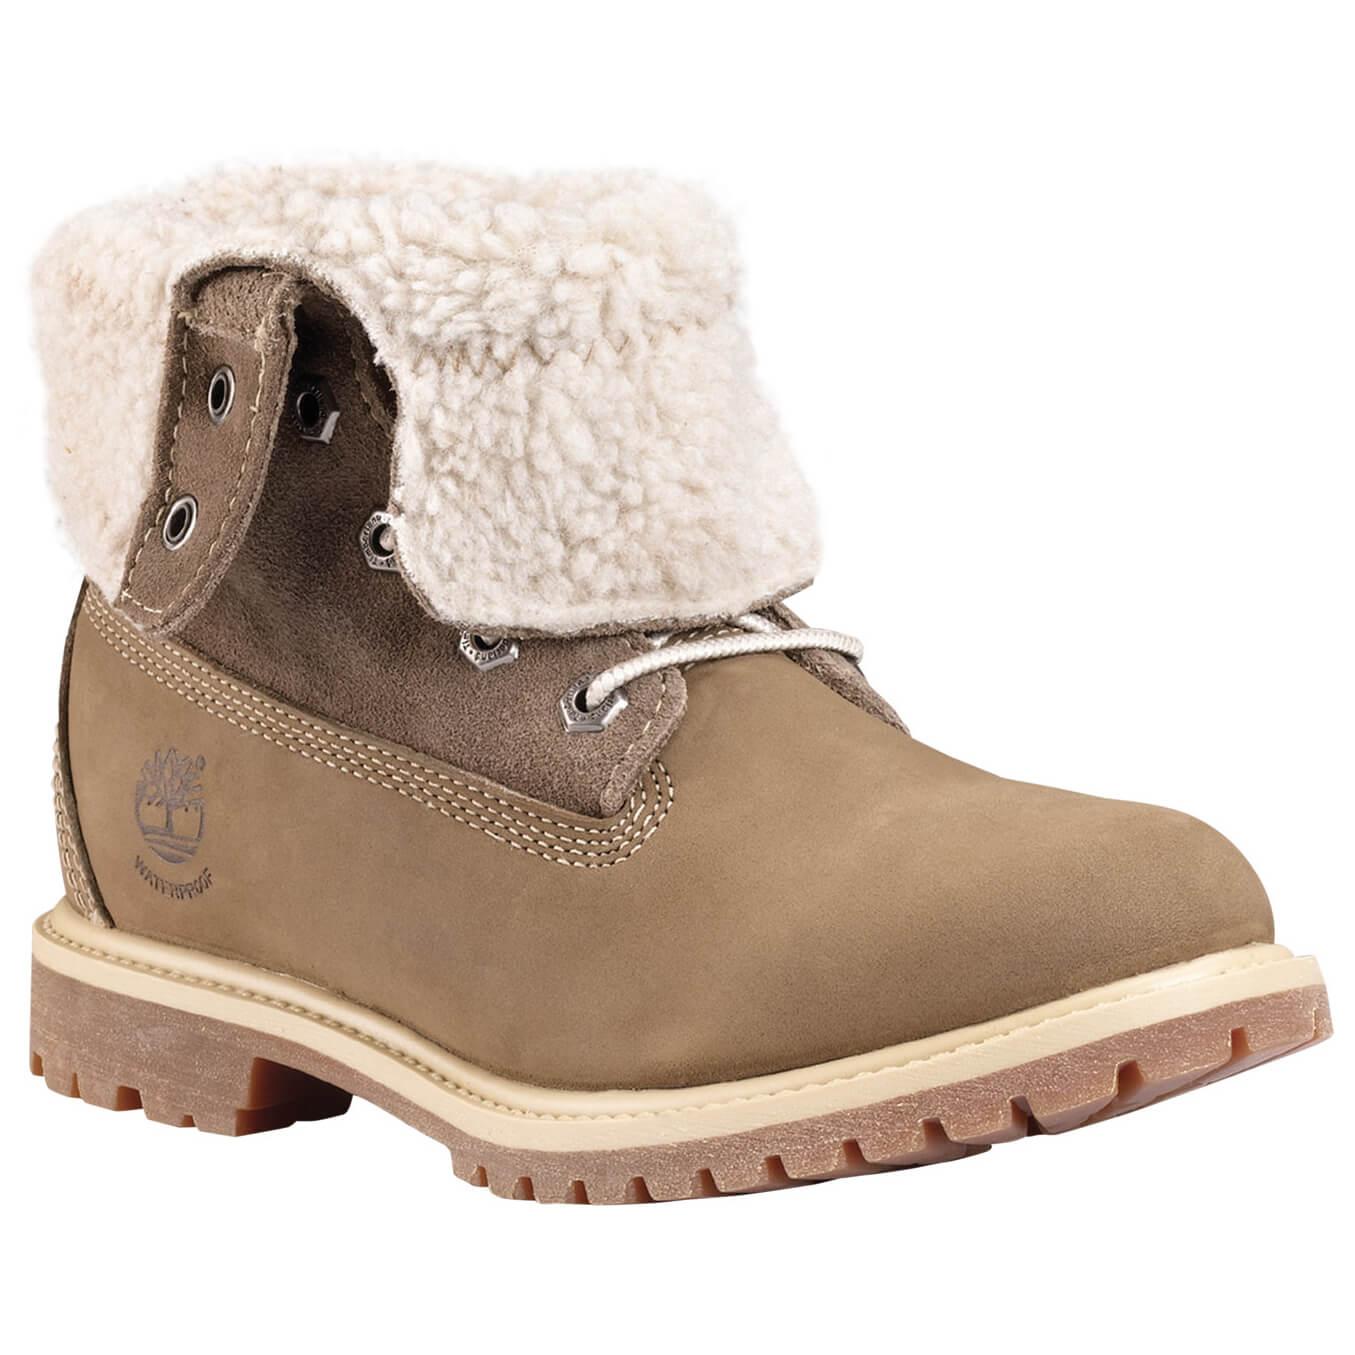 sale retailer 1eb11 7ebc8 timberland-womens-auth-teddy-fleece-wp-scarpe-invernali.jpg